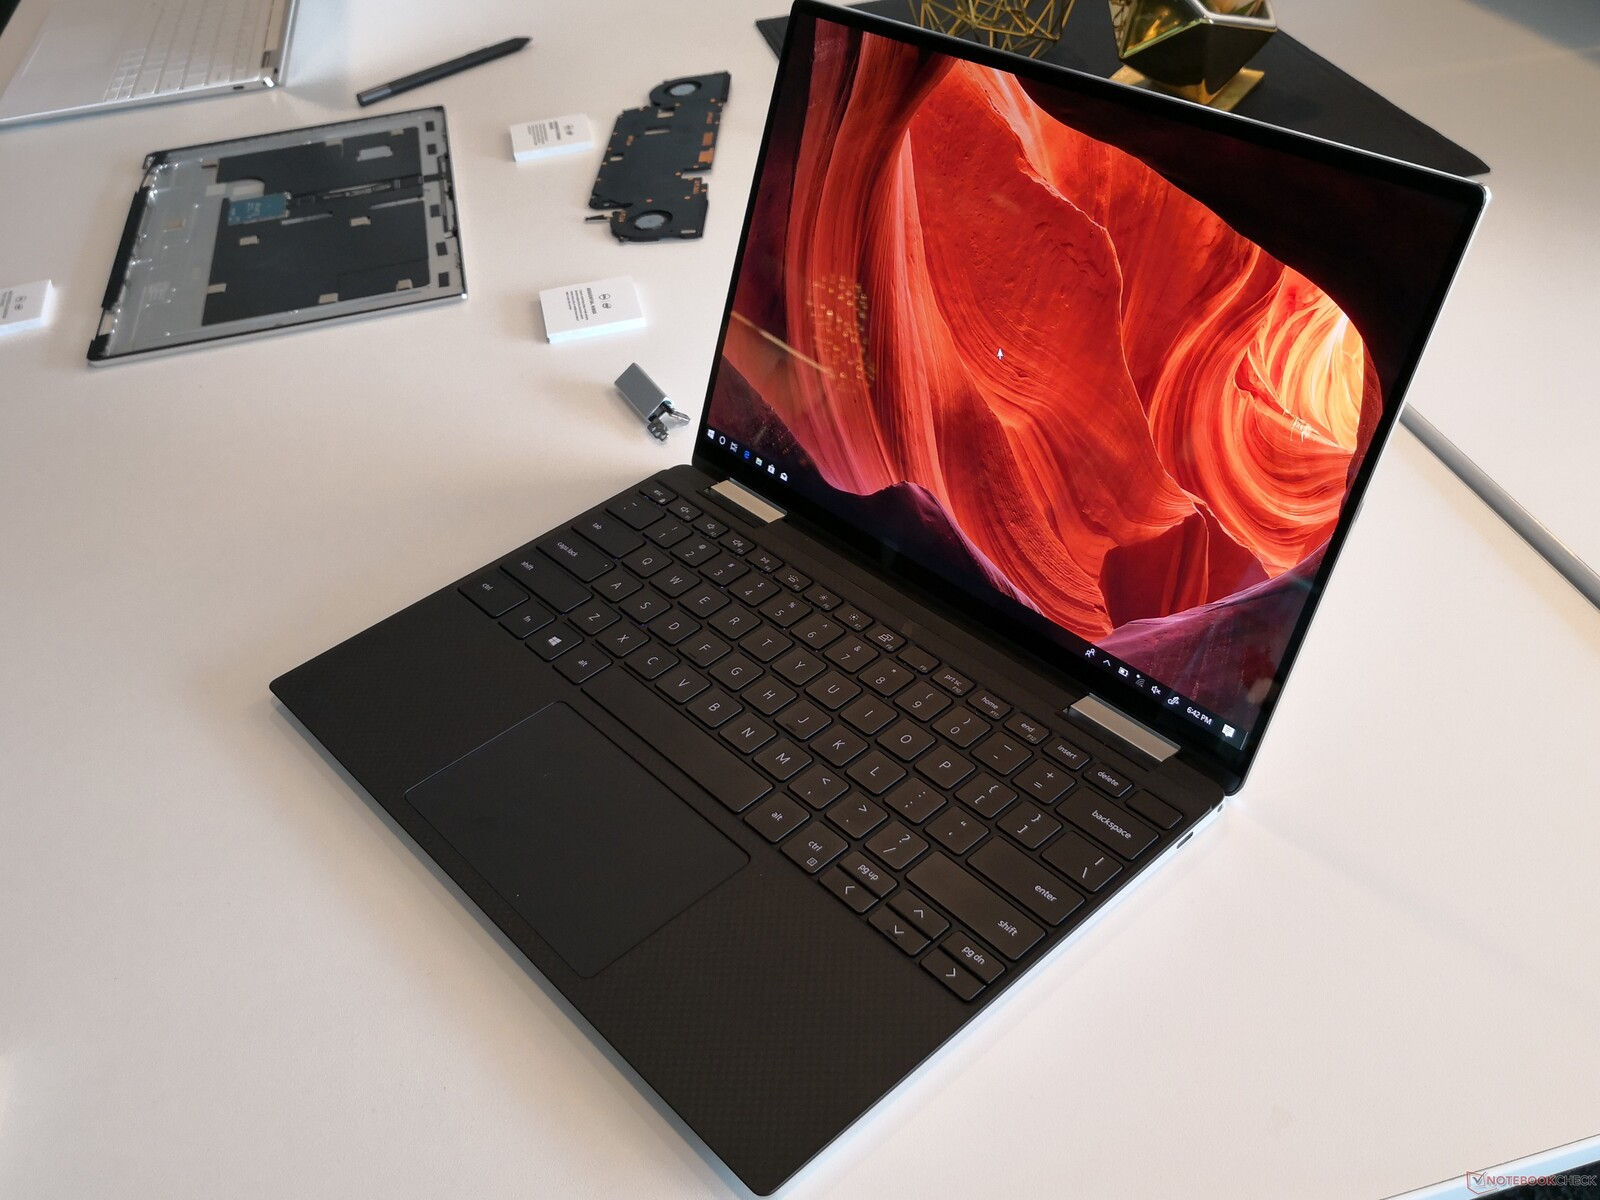 Intel announces 8 core i9-9900KS processor